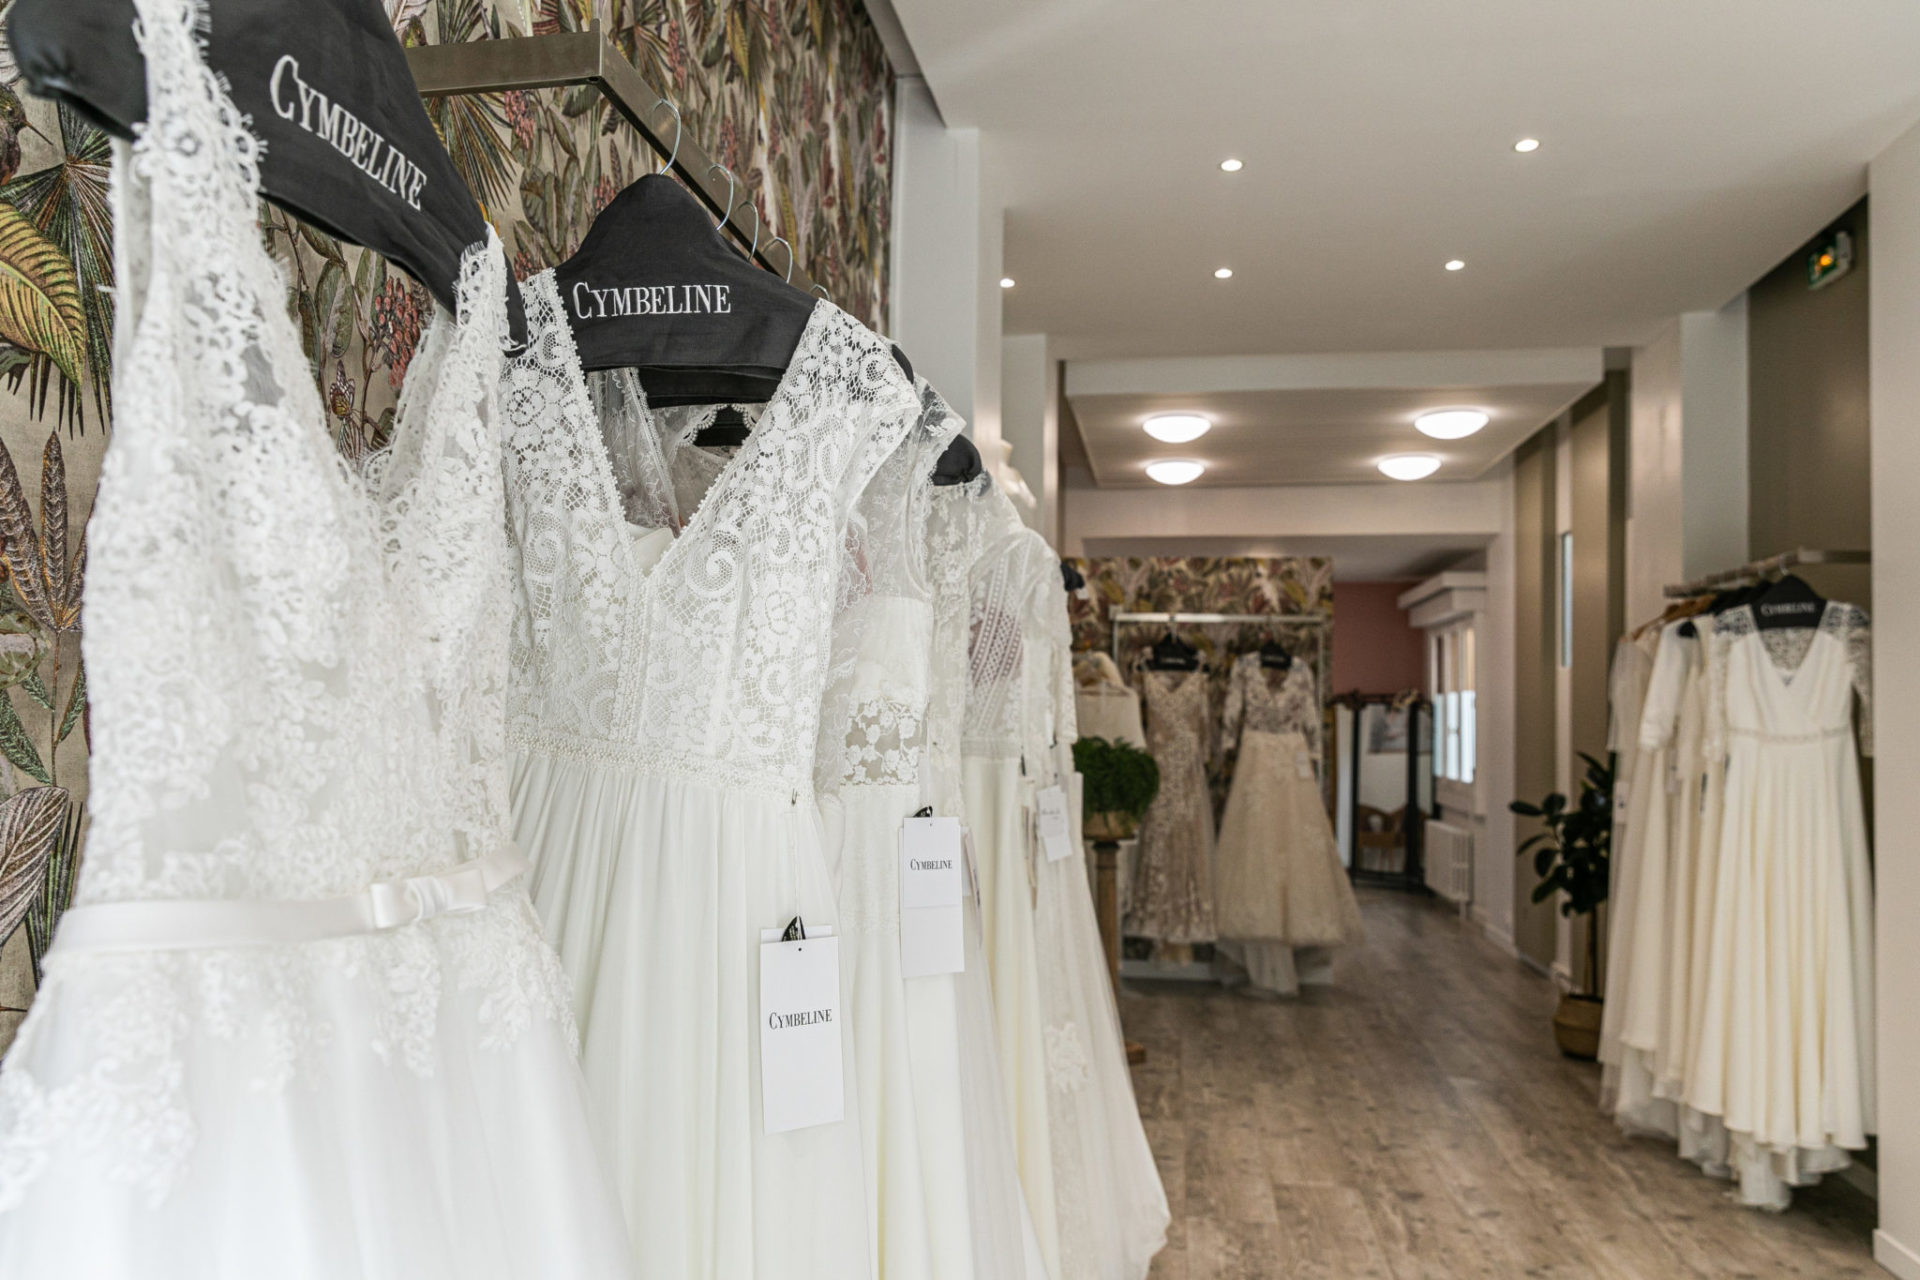 Boutique Cymbeline Caen - Cymbeline - Robes